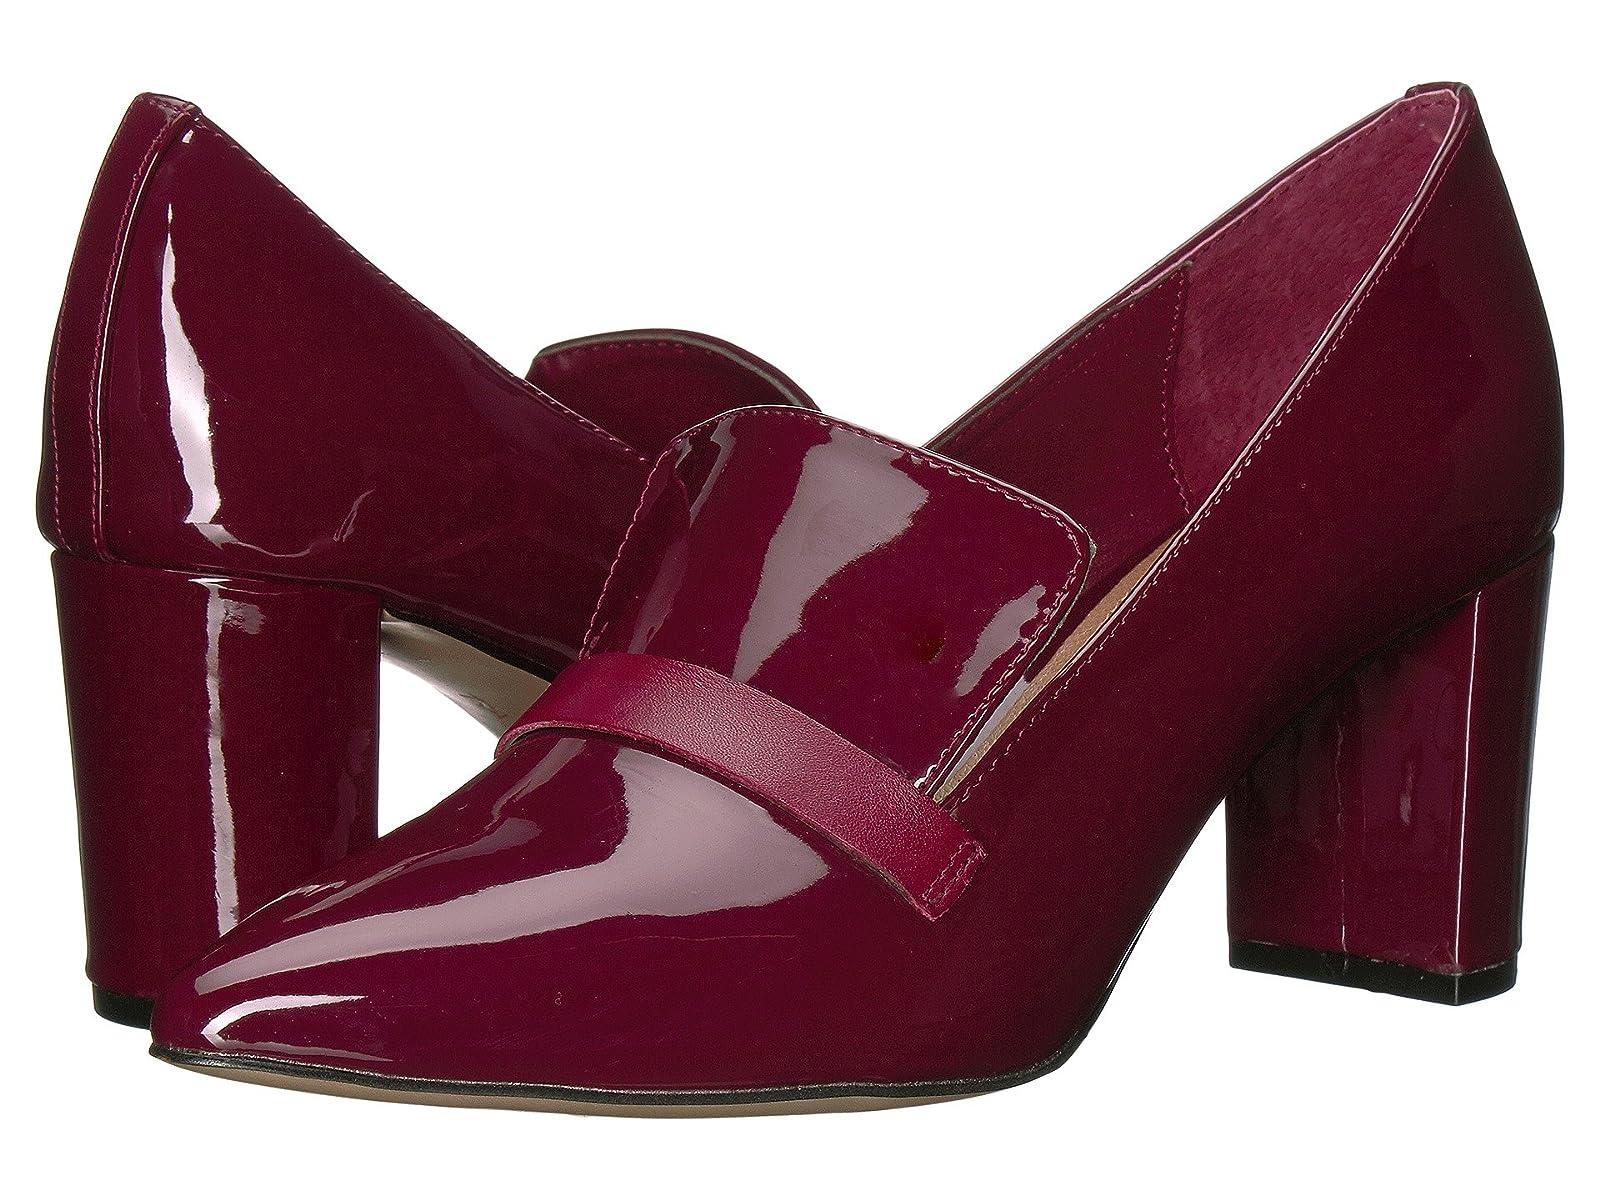 Tahari TabithaCheap and distinctive eye-catching shoes